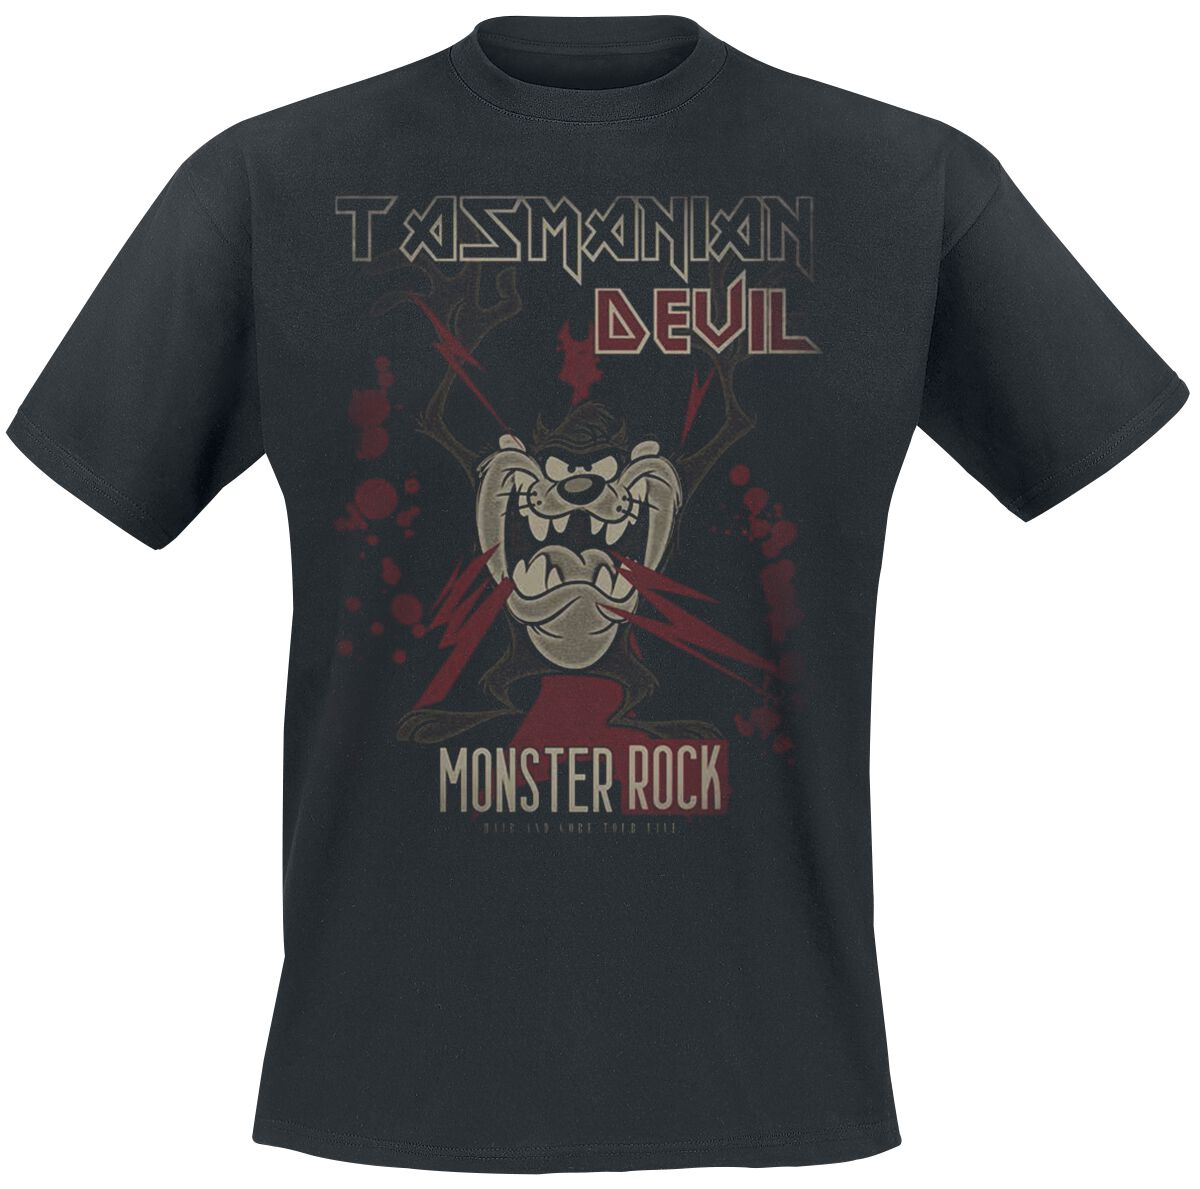 Merch dla Fanów - Koszulki - T-Shirt Looney Tunes Tasmanian Devil Monster Rock T-Shirt czarny - 372692